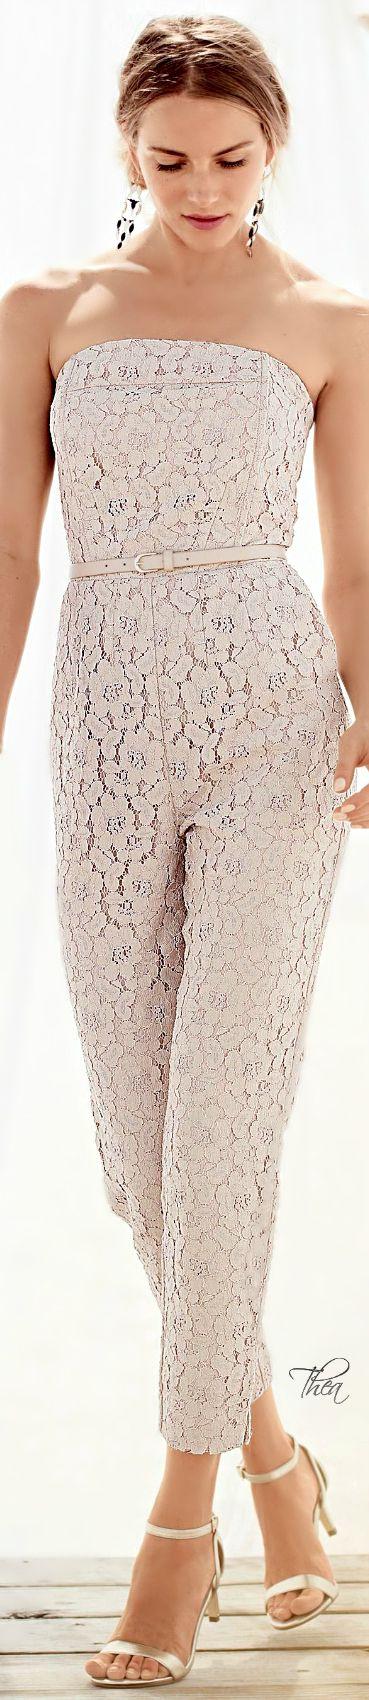 Blush Lace Jumpsuit •  Street 'CHIC #abbigliamento